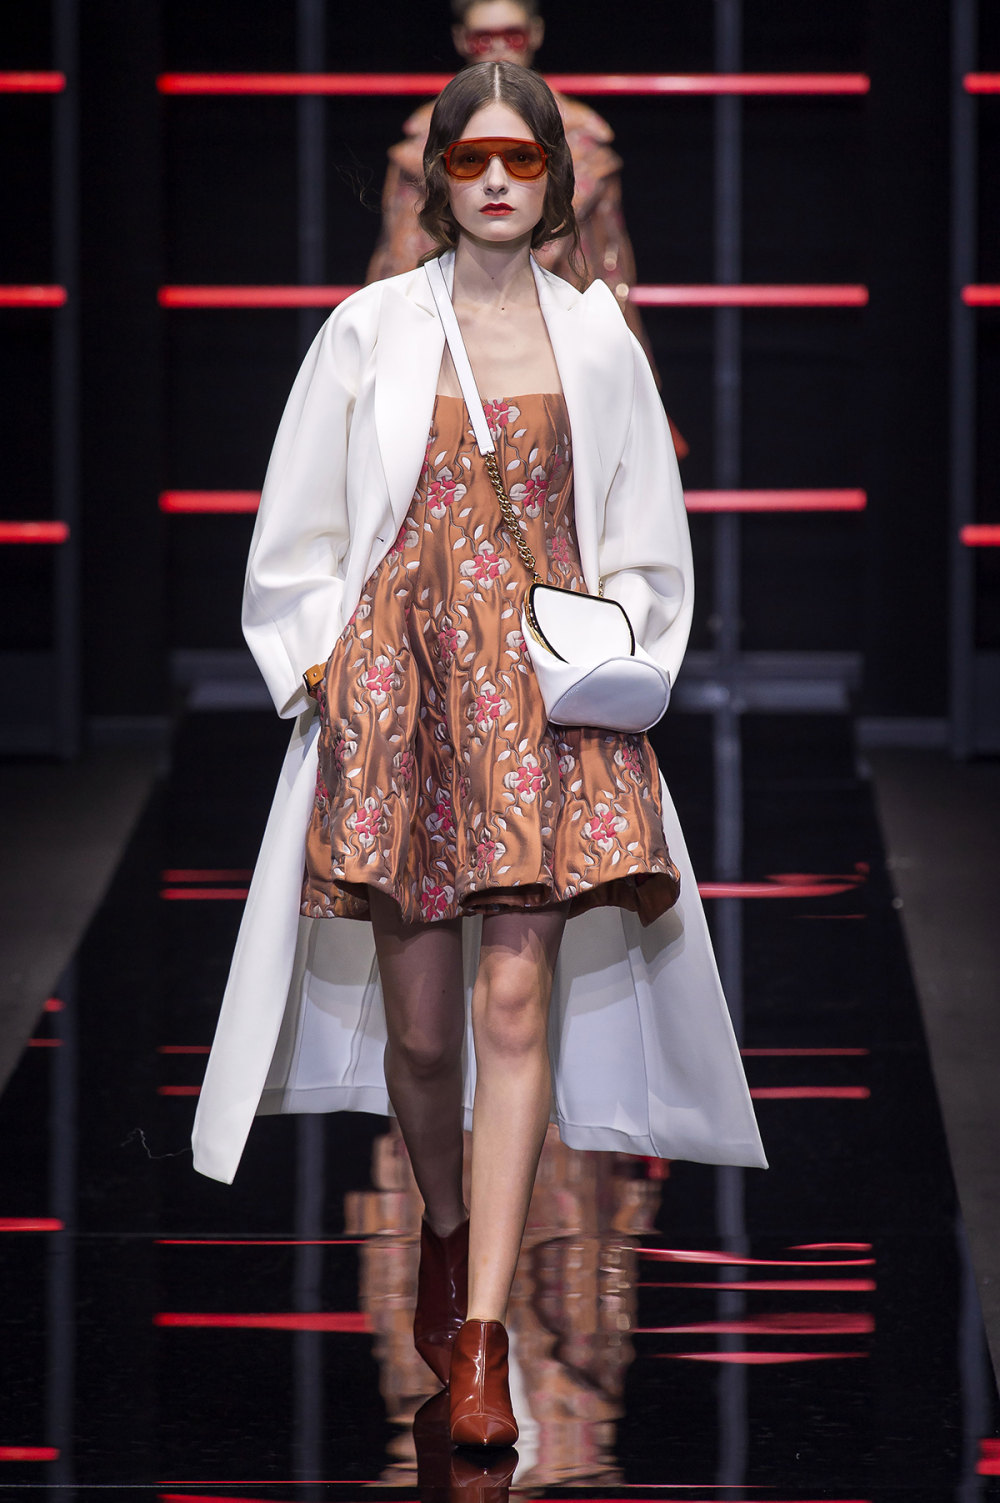 Emporio Armani时装系列畅的裤子带有柔滑裙子的鸡尾酒礼服-1.jpg